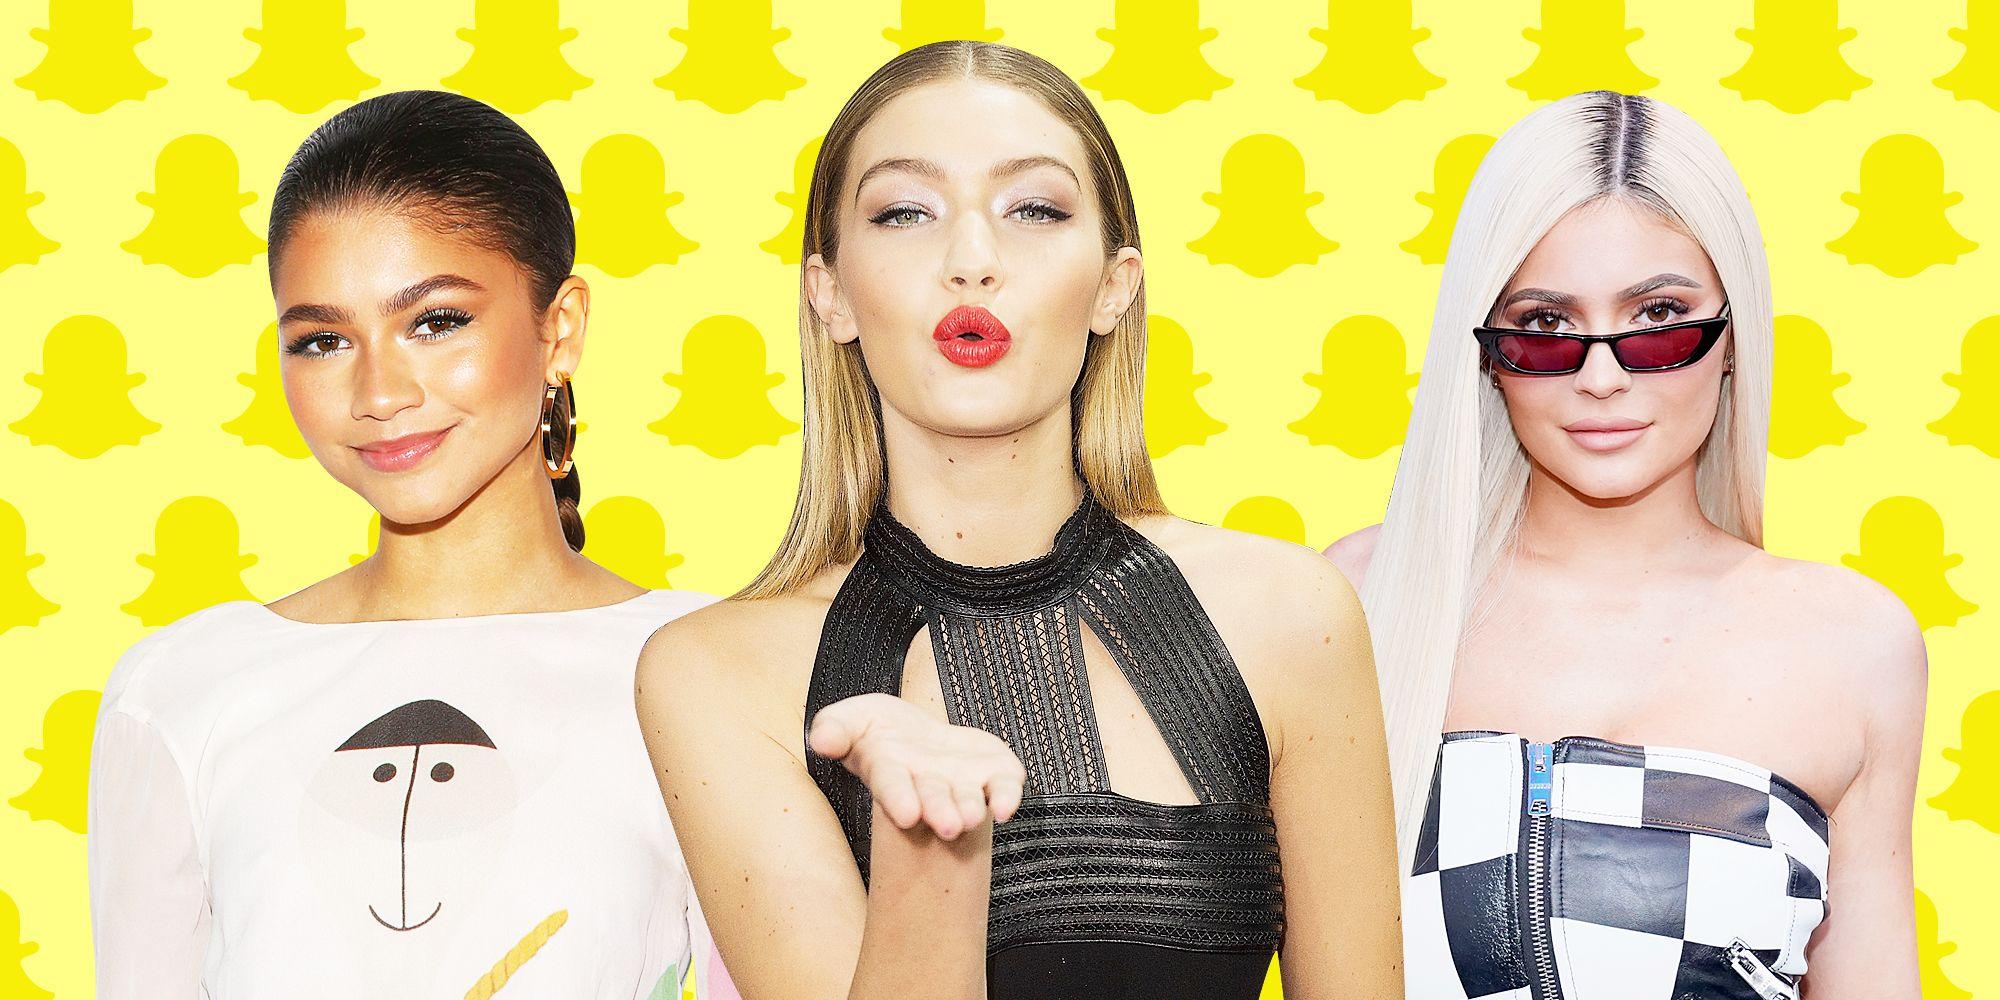 Hot guys on snapchat names